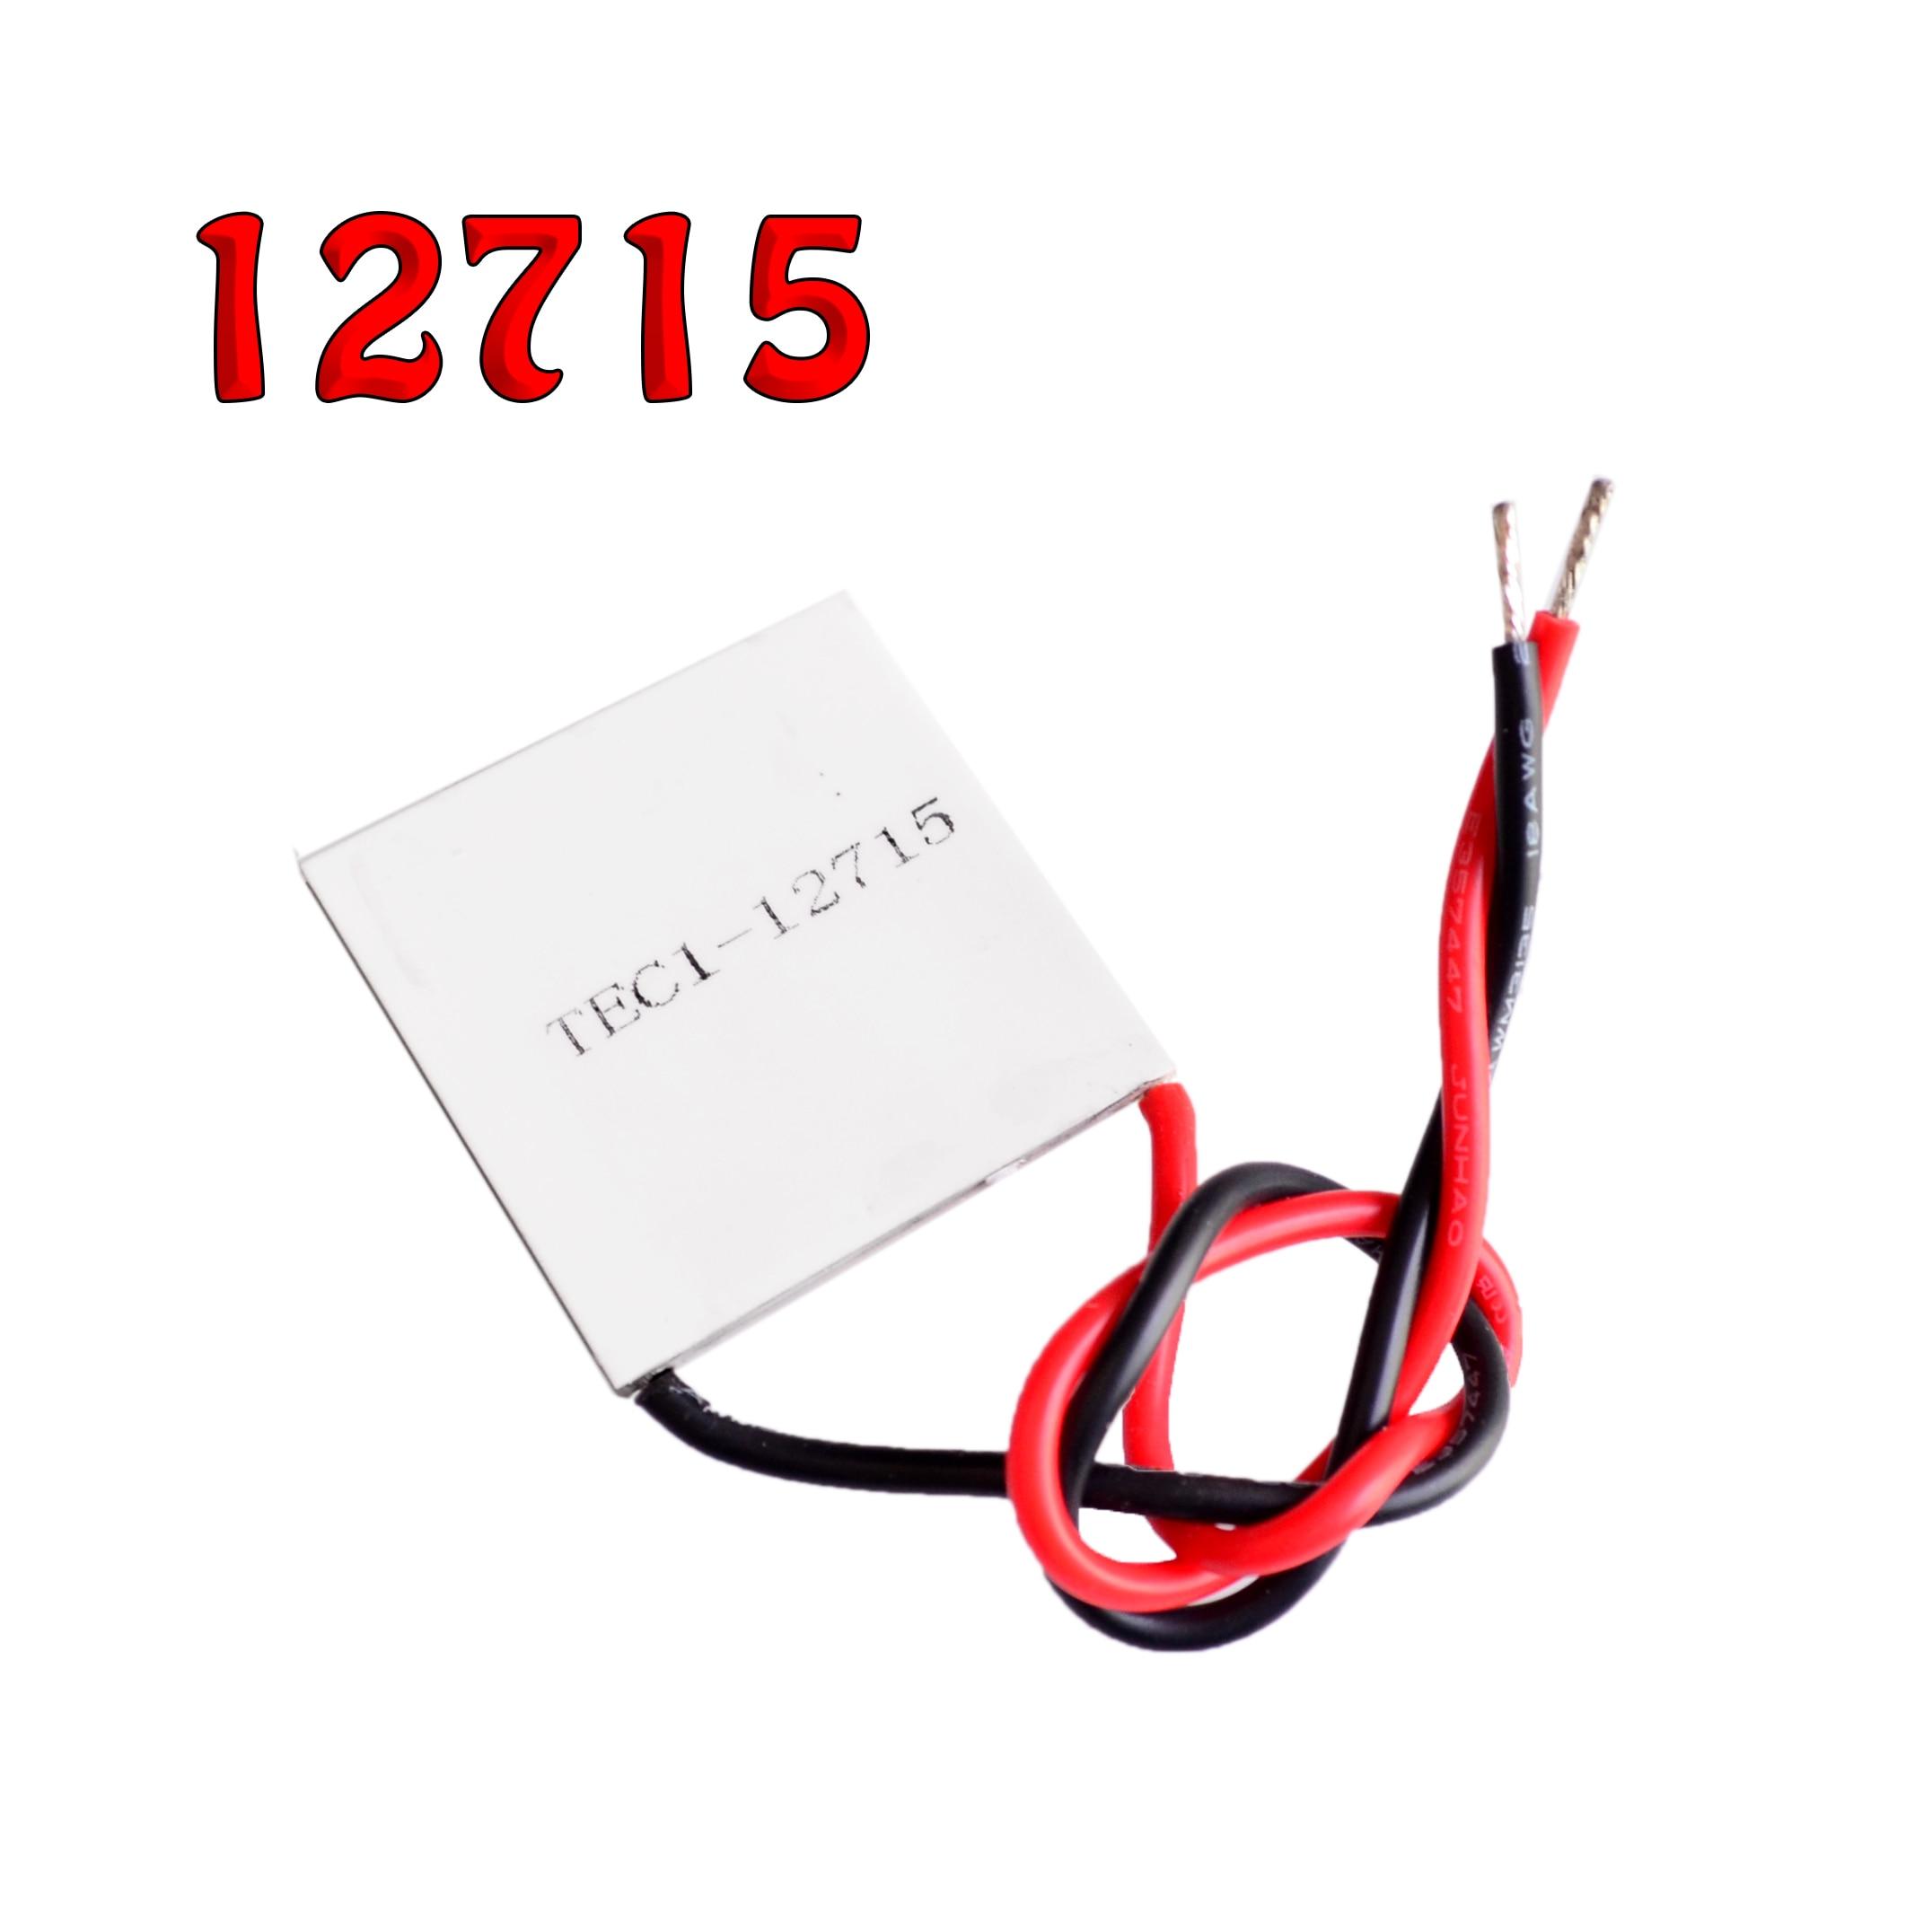 10pcs lot TEC1 12715 Heatsink Thermoelectric Cooler Cooling Peltier Plate Module